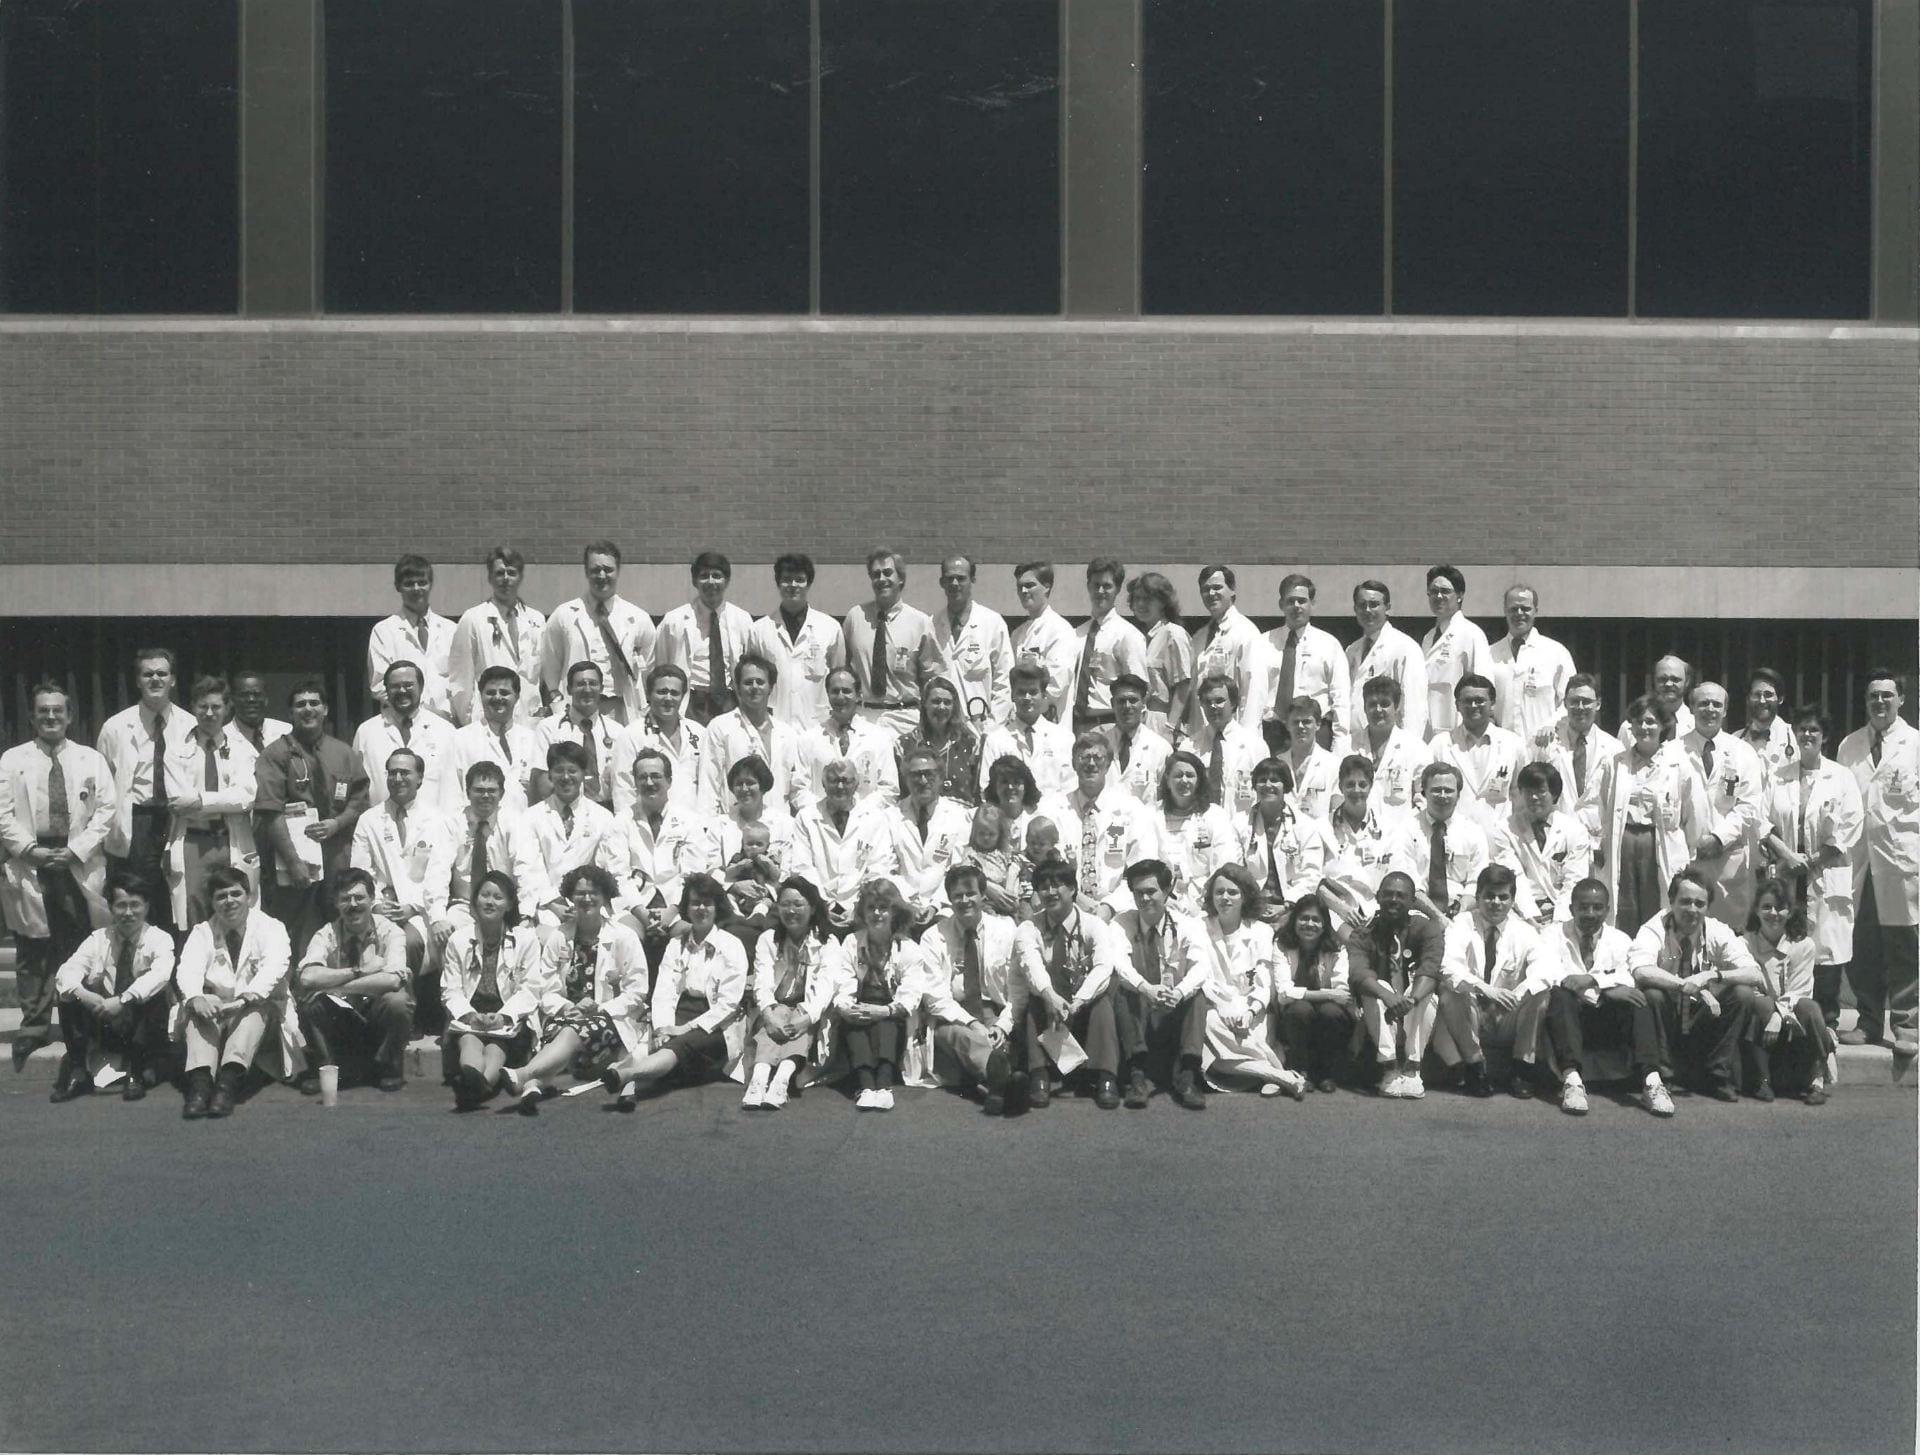 1991 Housestaff Photo